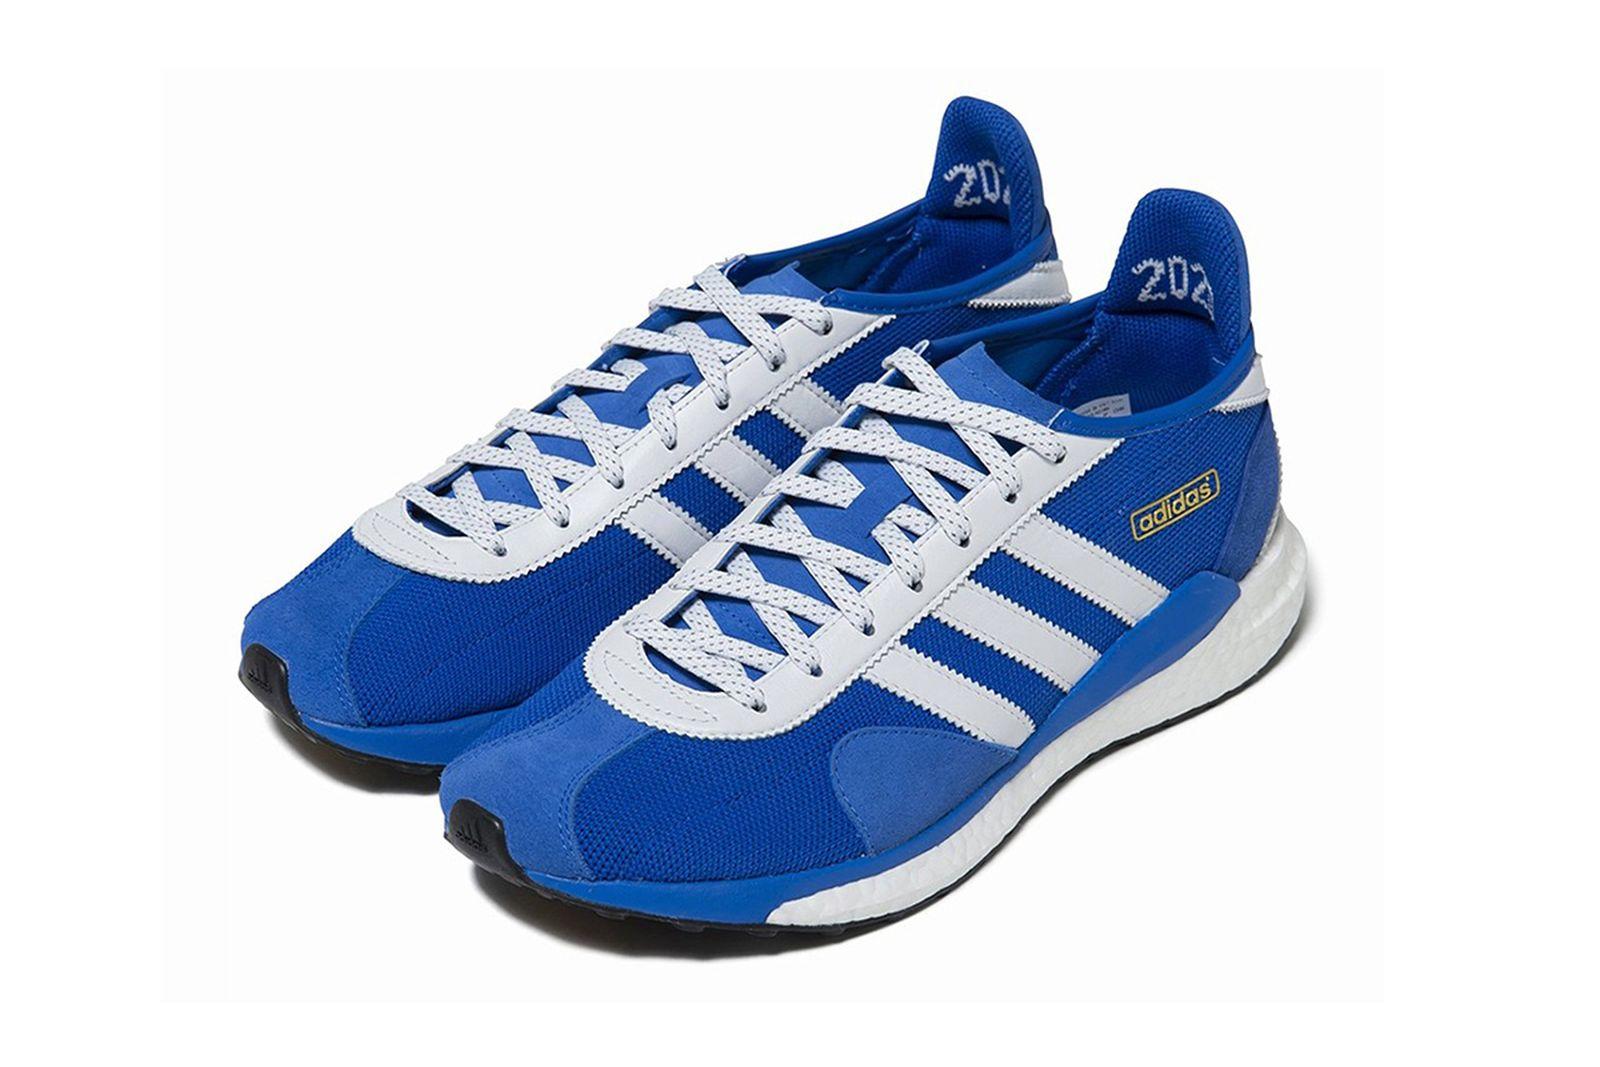 human-made-adidas-tokio-solar-release-date-price-03